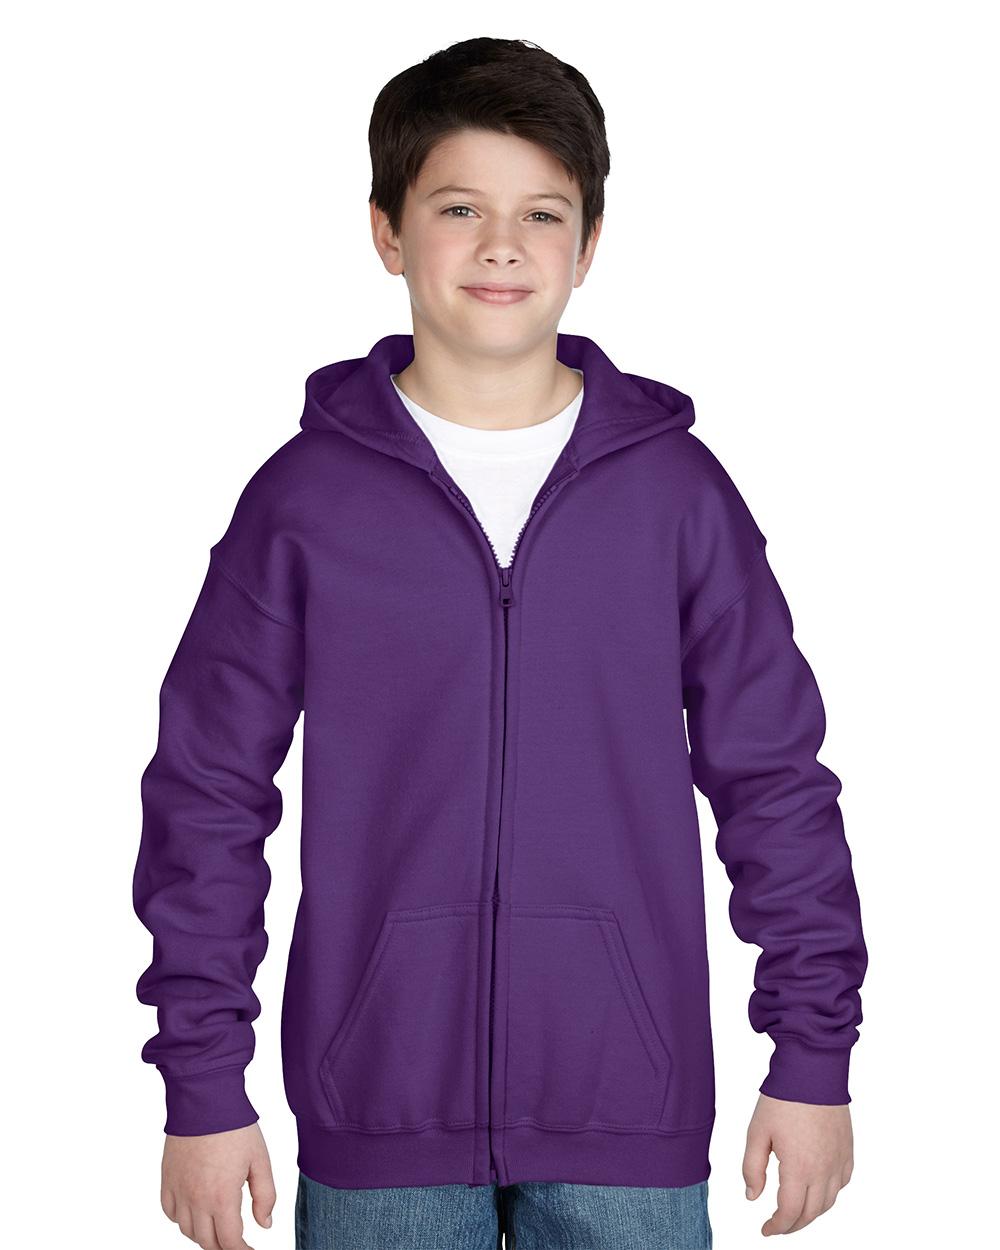 Gildan 18600B     Classic Fit Youth Full Zip Sweatshir  t    50% Cotton / 50% Polyester Fleece